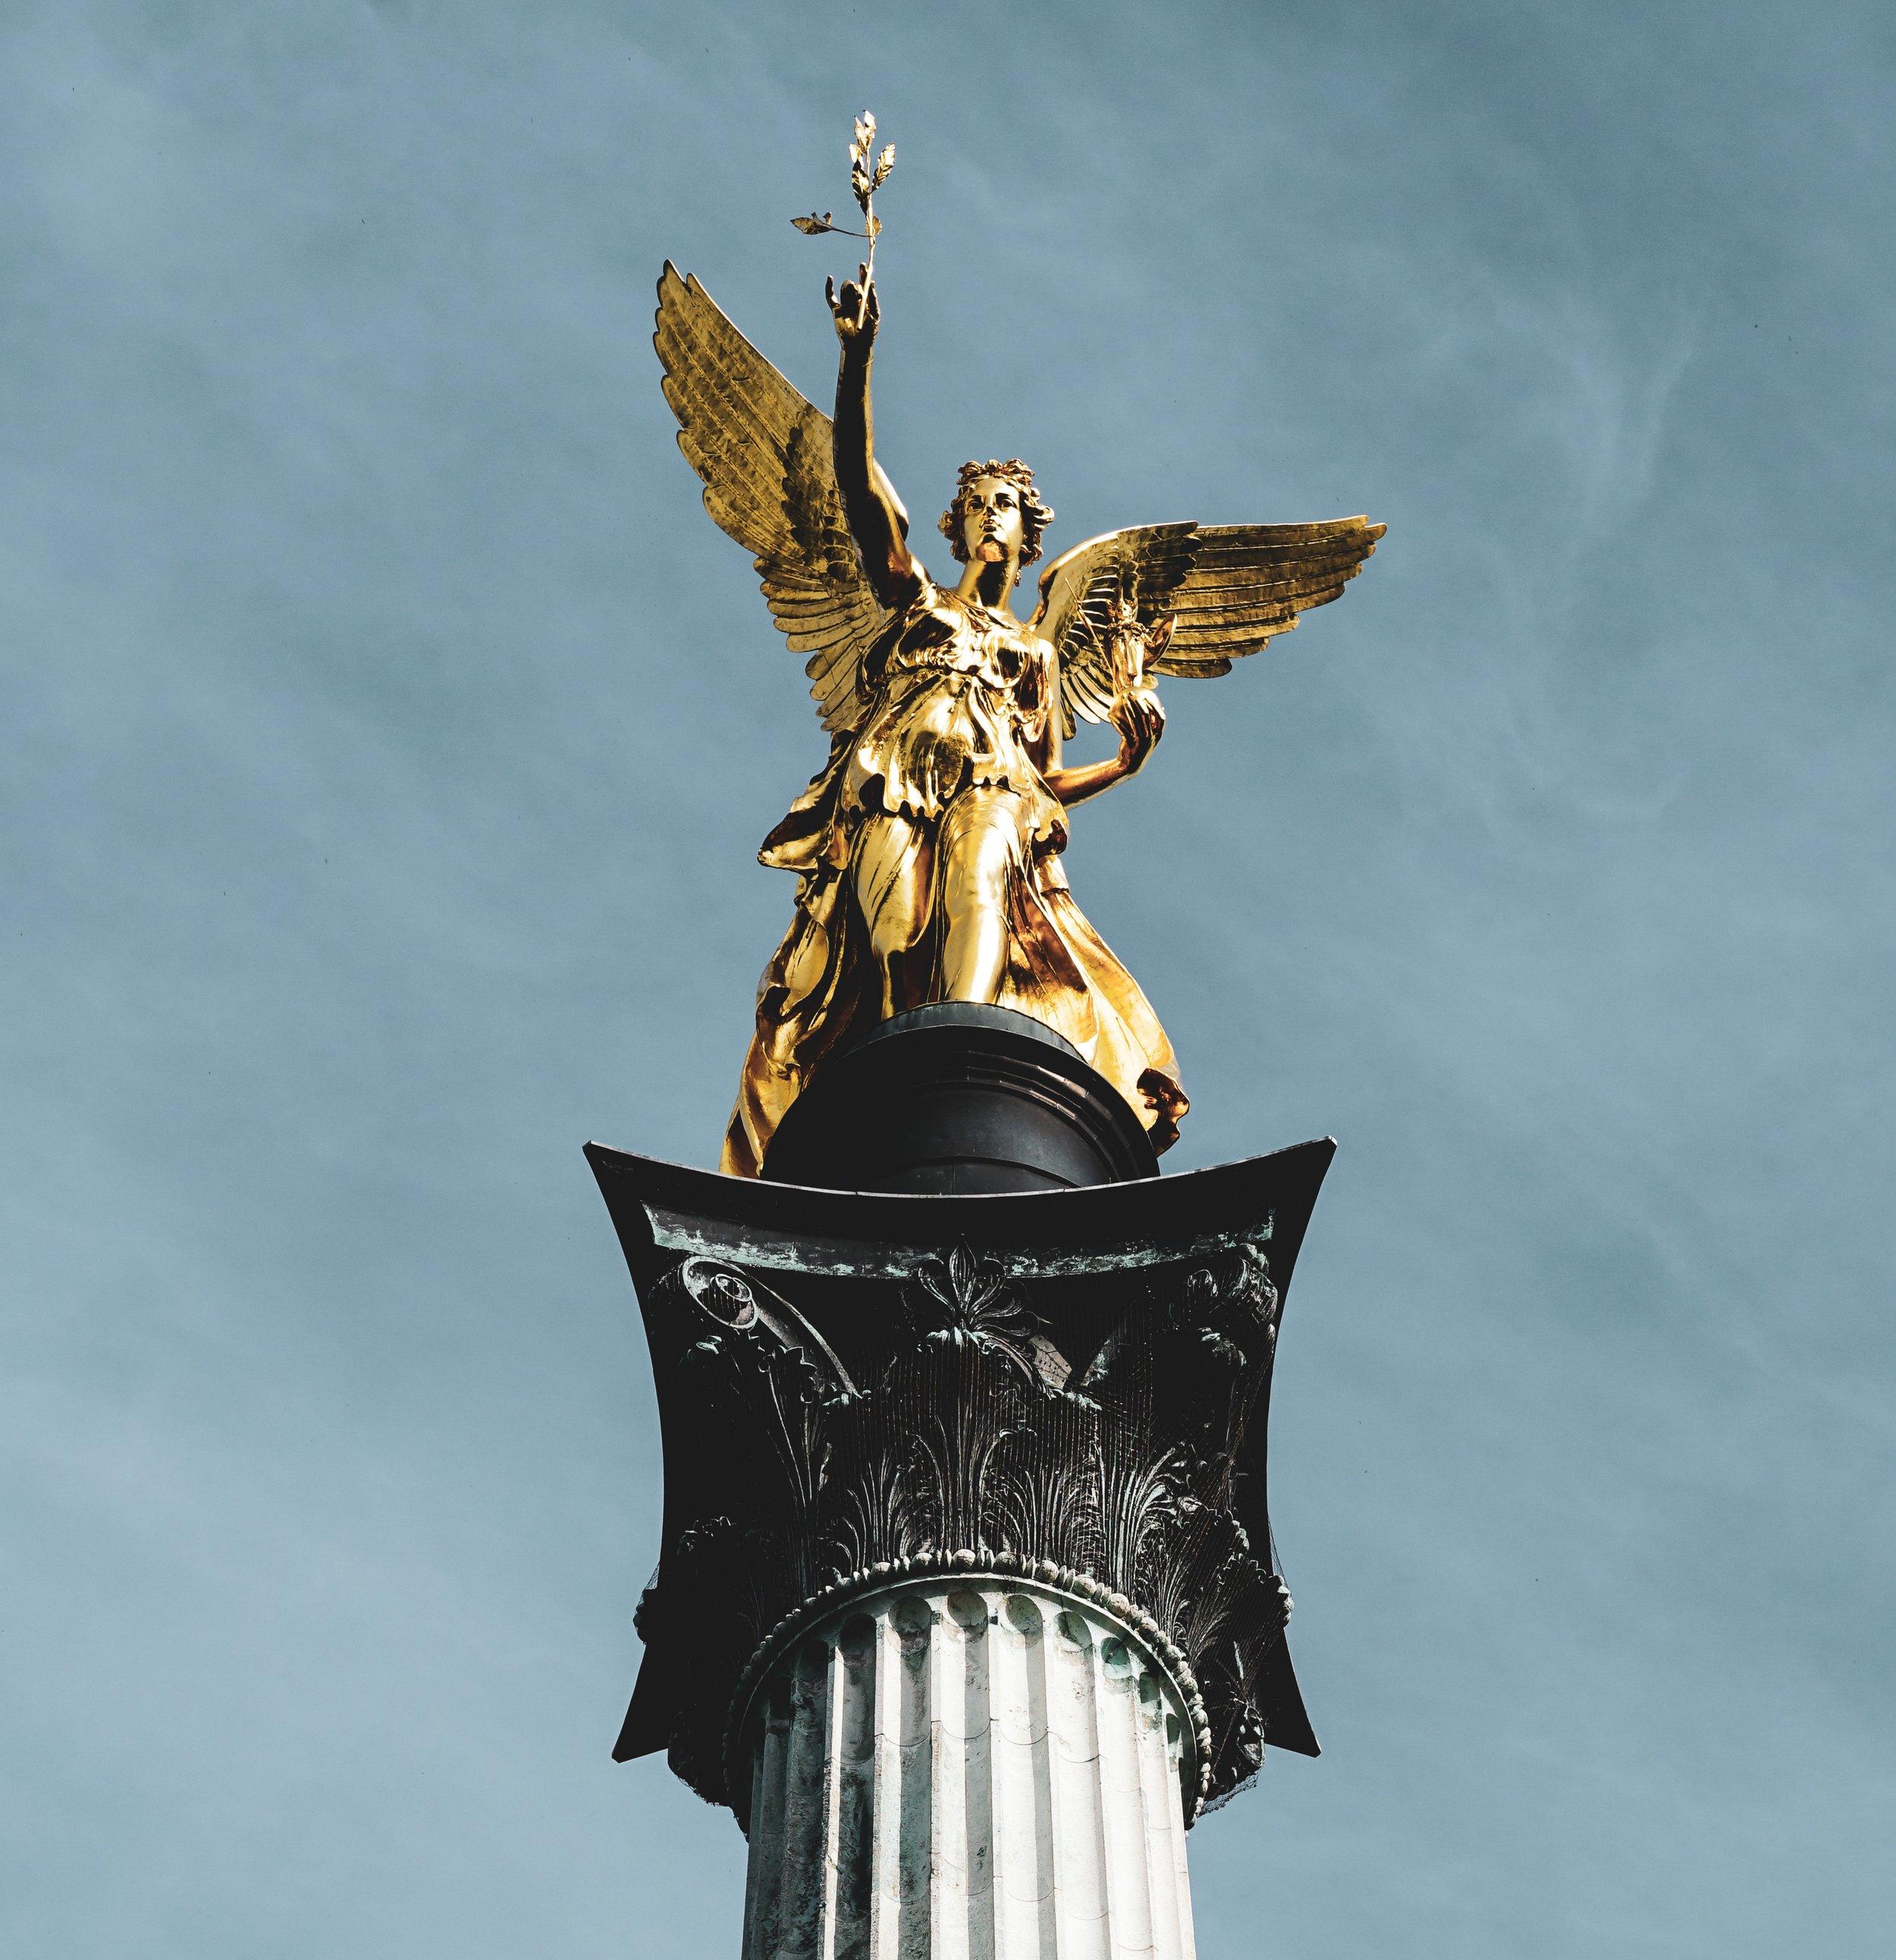 ancient-angel-of-peace-art-1748812.jpg